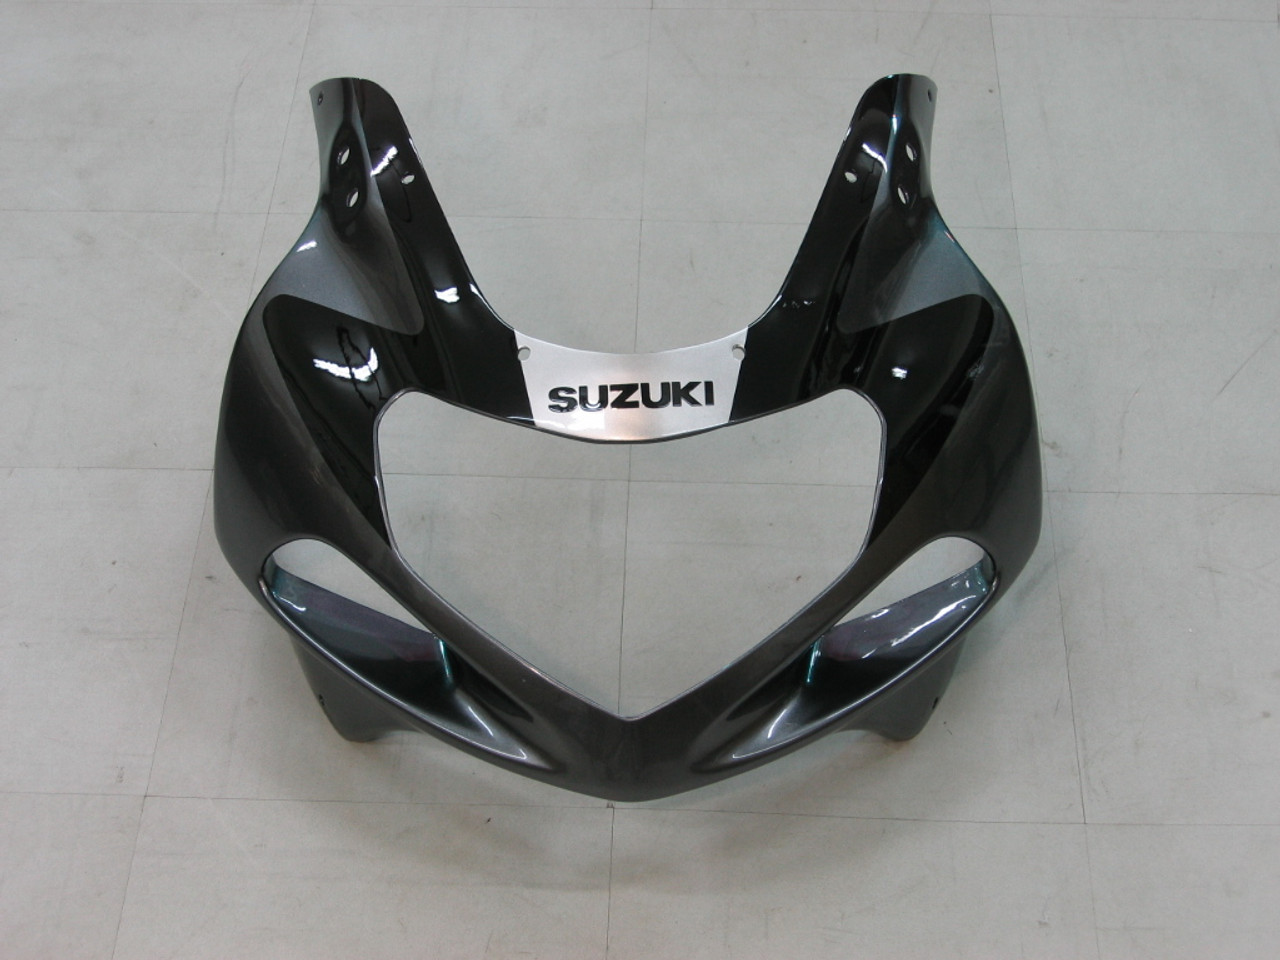 Fairings Suzuki GSXR 1000 Silver & Black Racing  (2000-2002)